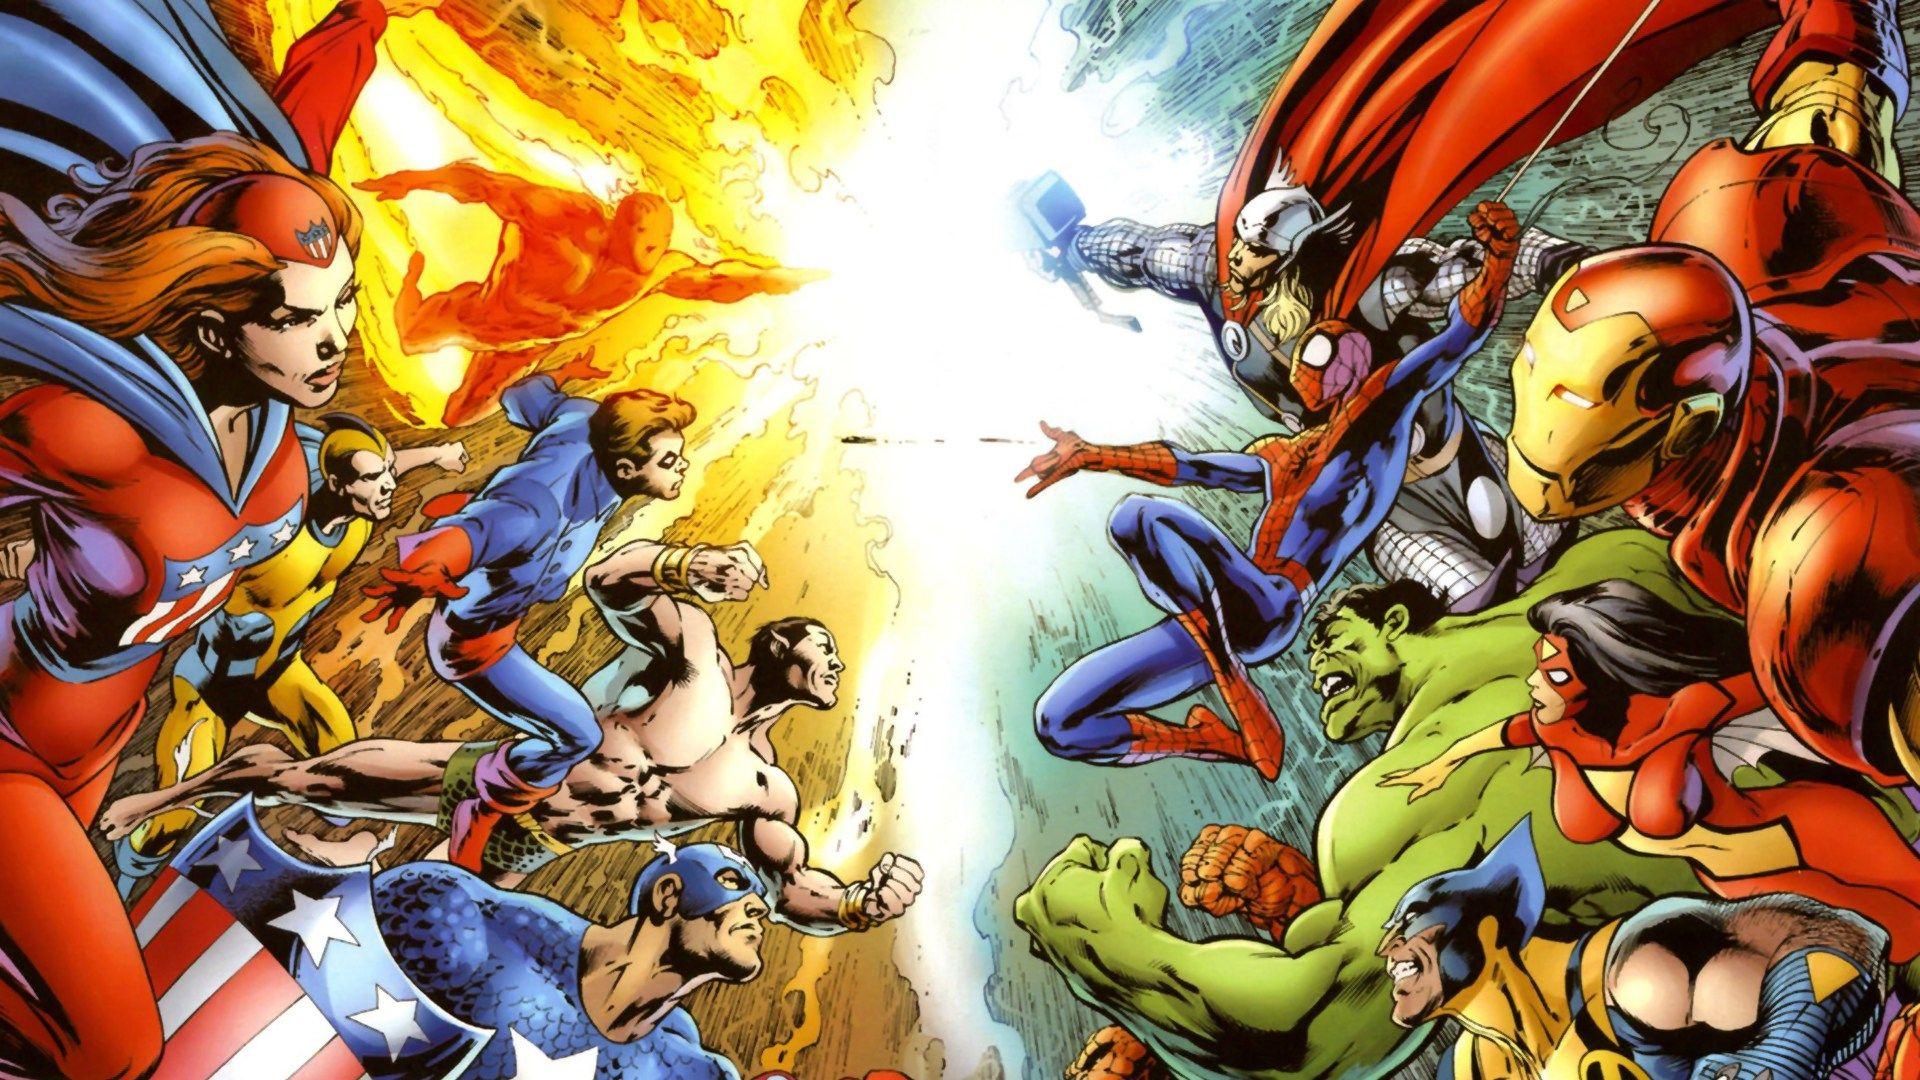 Обои На Рабочий Стол Супергерои